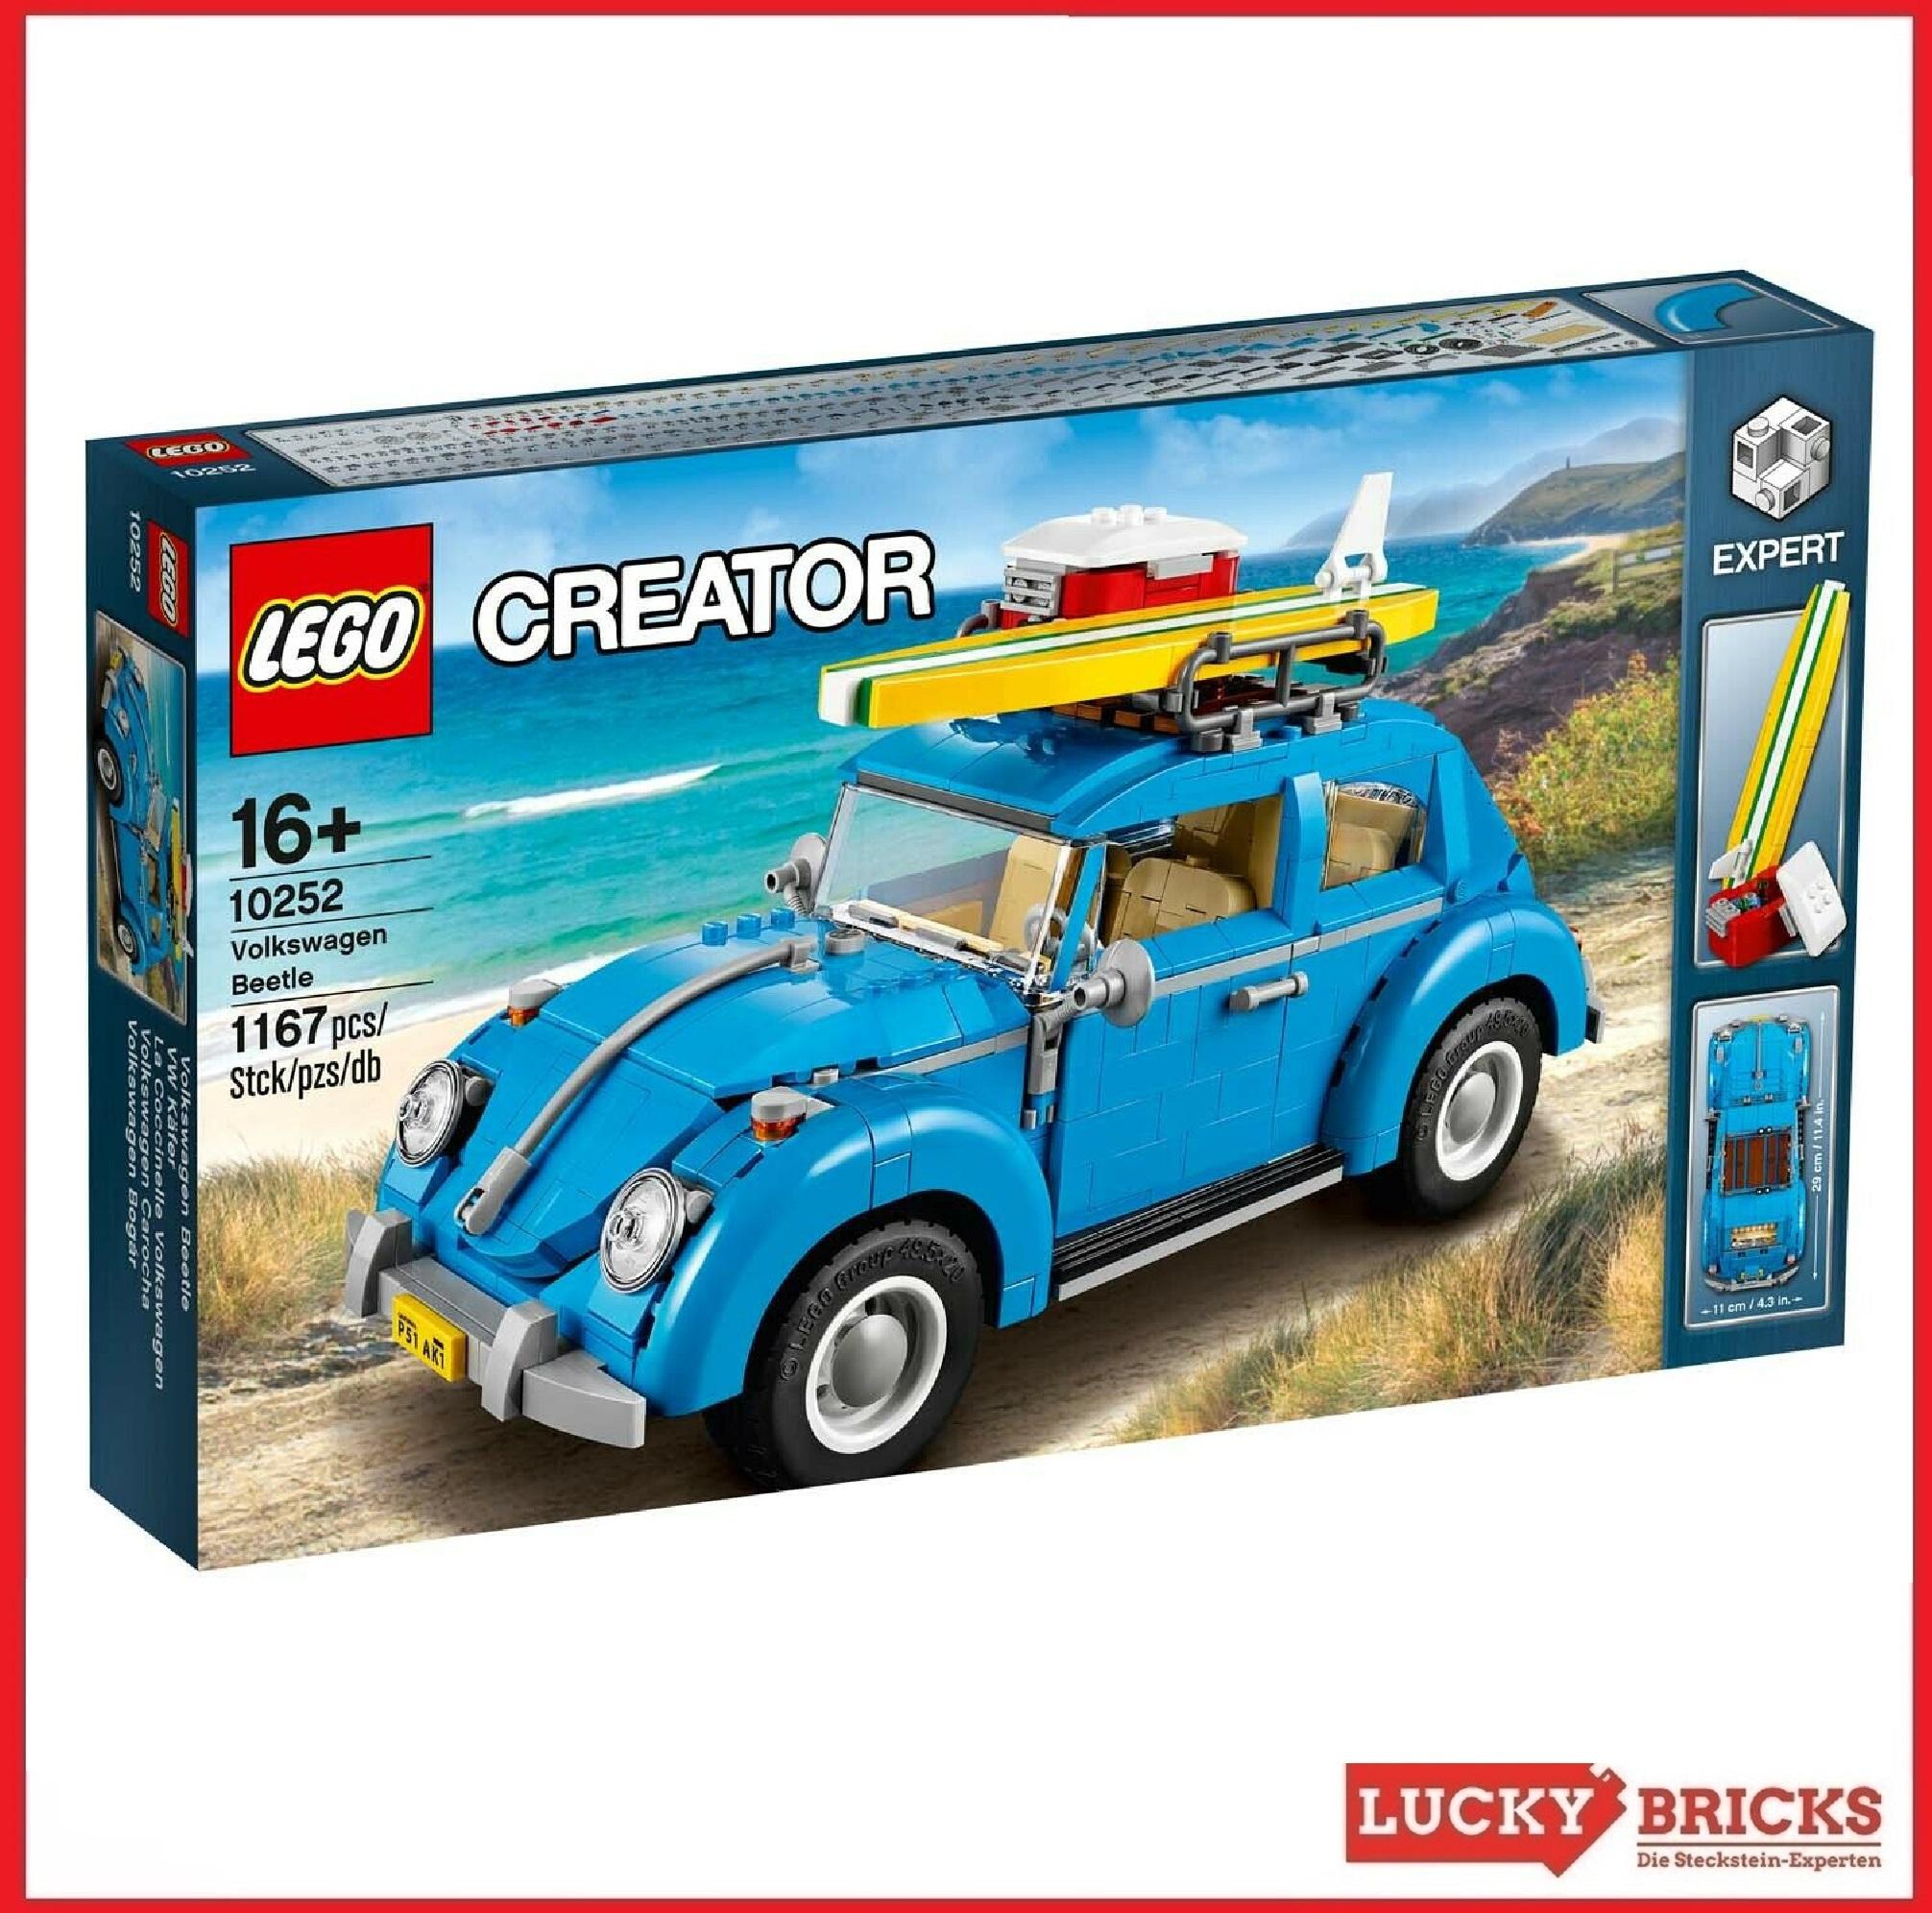 Acrylglas Vitrine Haube für LEGO Modell VW Beetle 10252